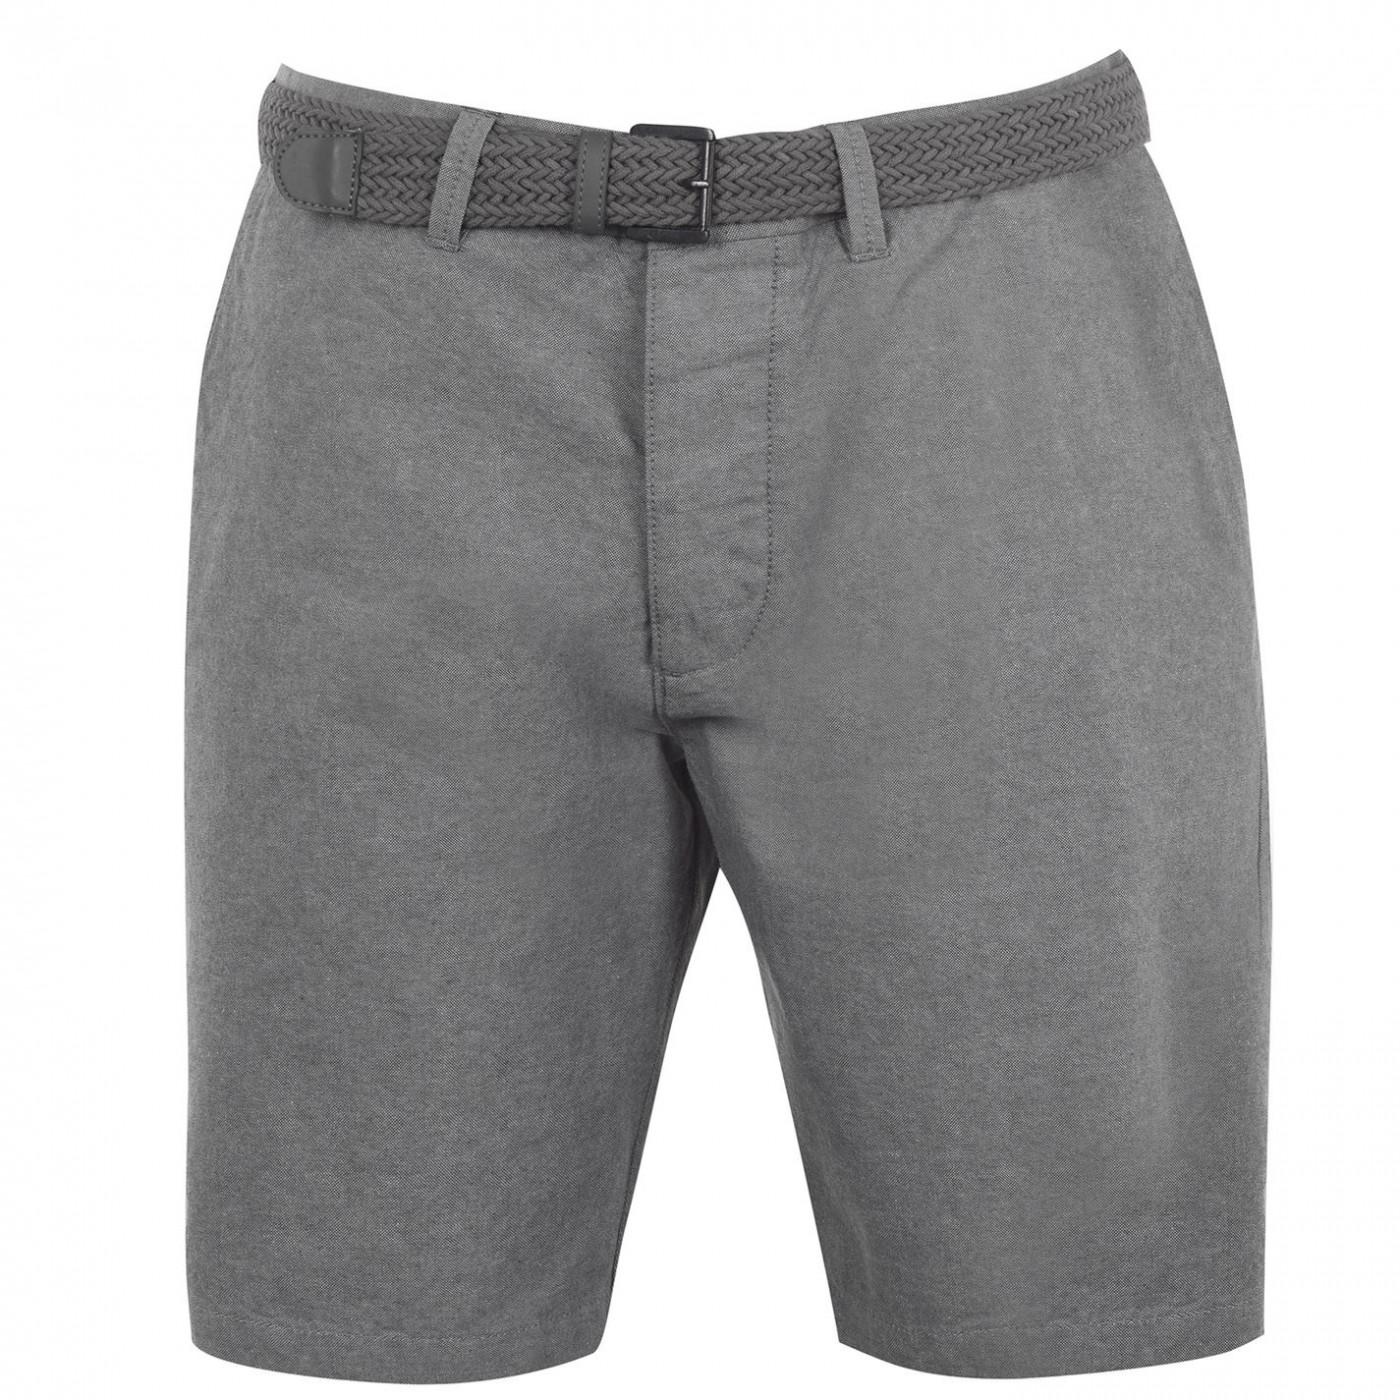 Men's shorts Pierre Cardin Oxford Chino